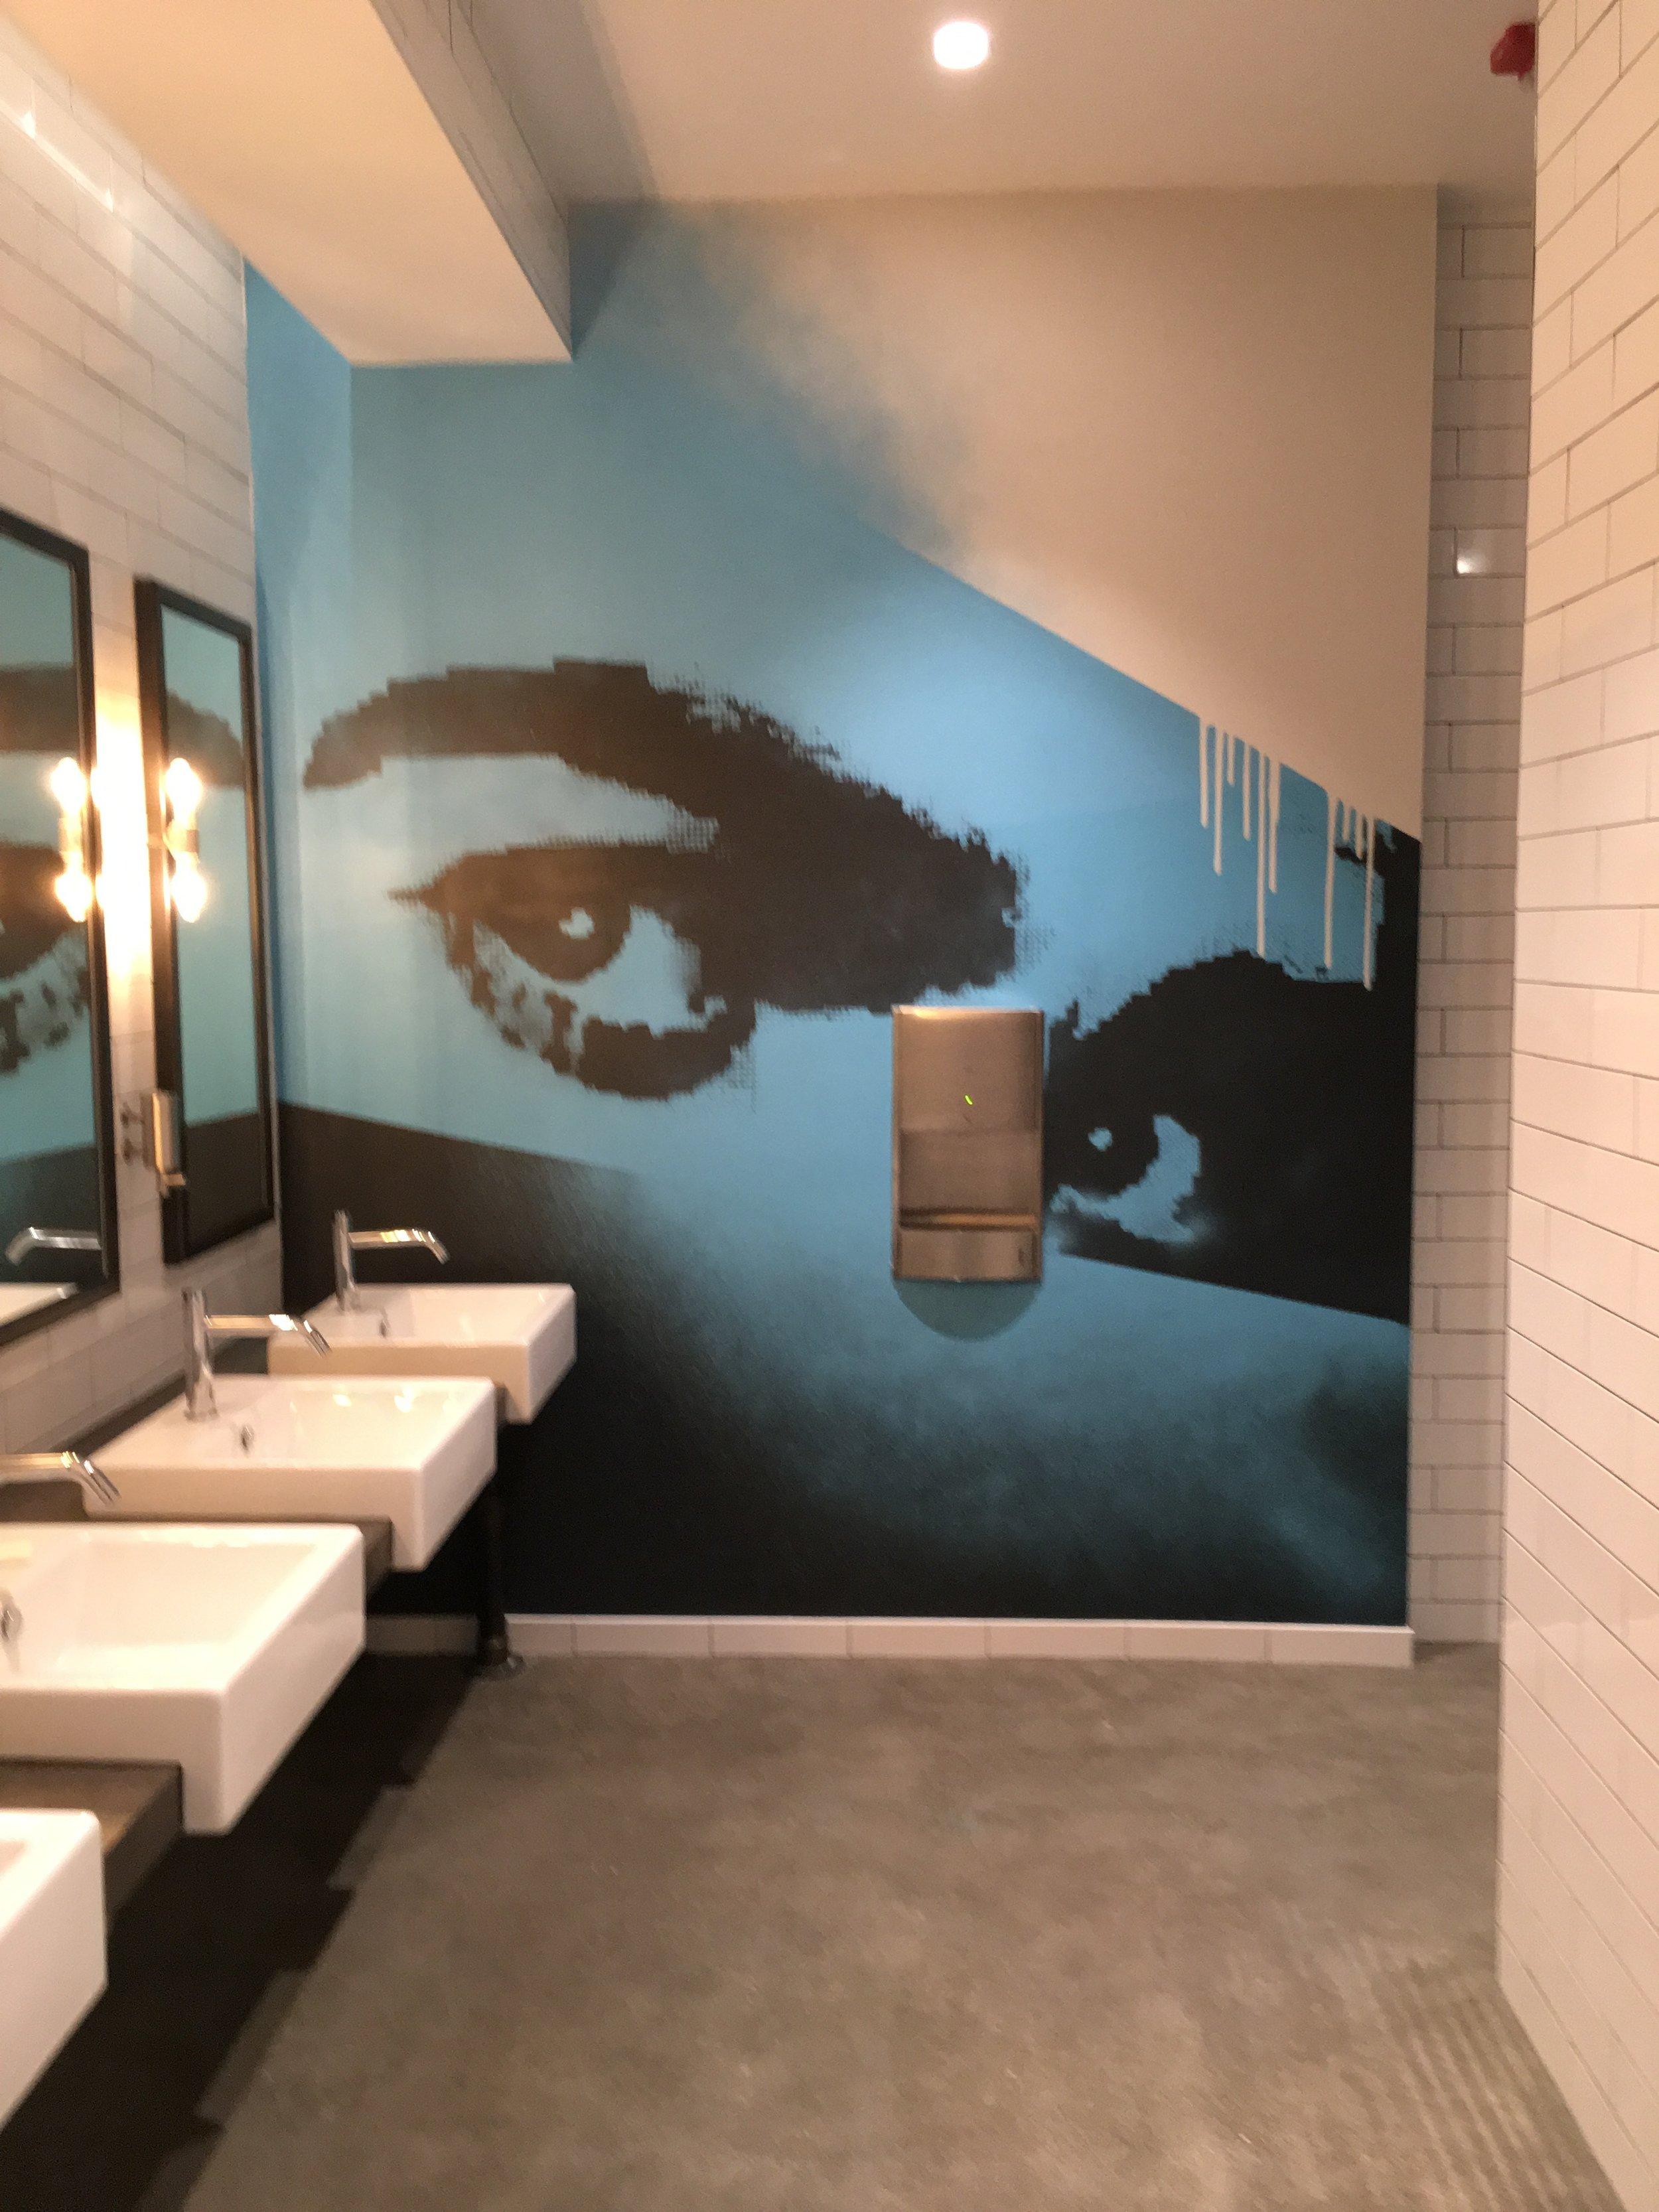 Office mural - San Francisco, CA 2016